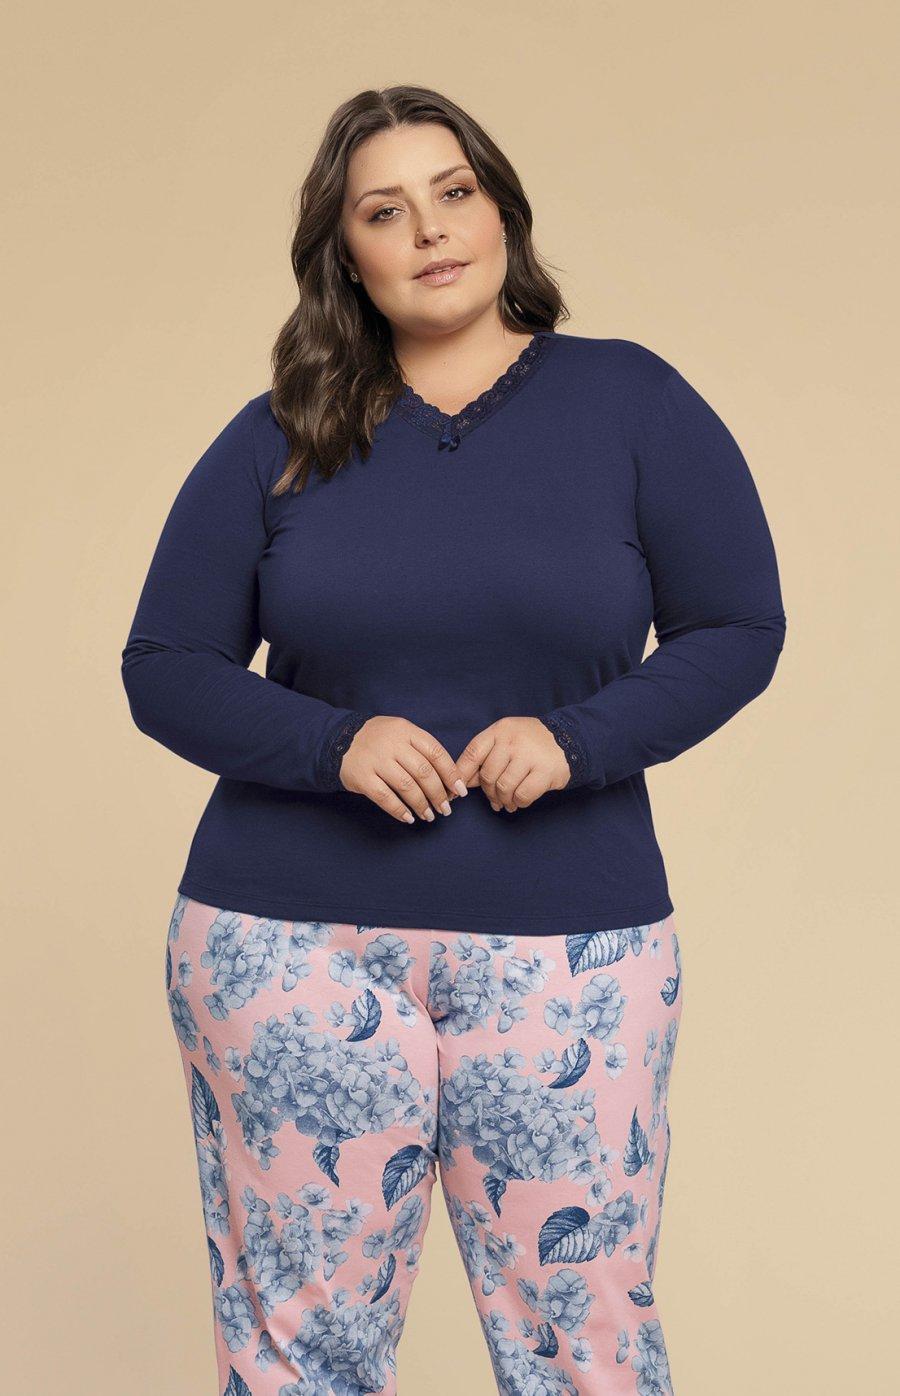 5b42165b5 Pijama Plus Size 100% Algodão Jardins Inverno 2019 CLOUD CLUB ...